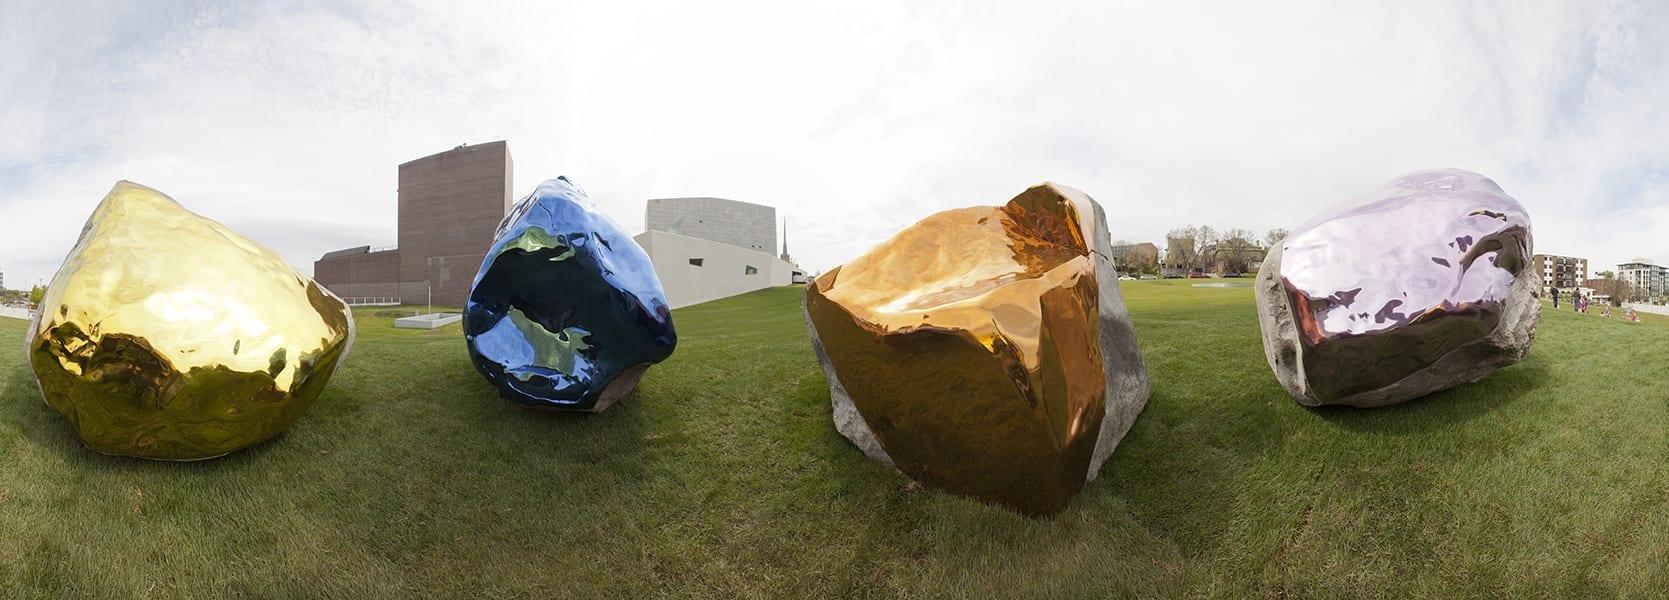 theceramicists-blog-jimhodges-rocks2